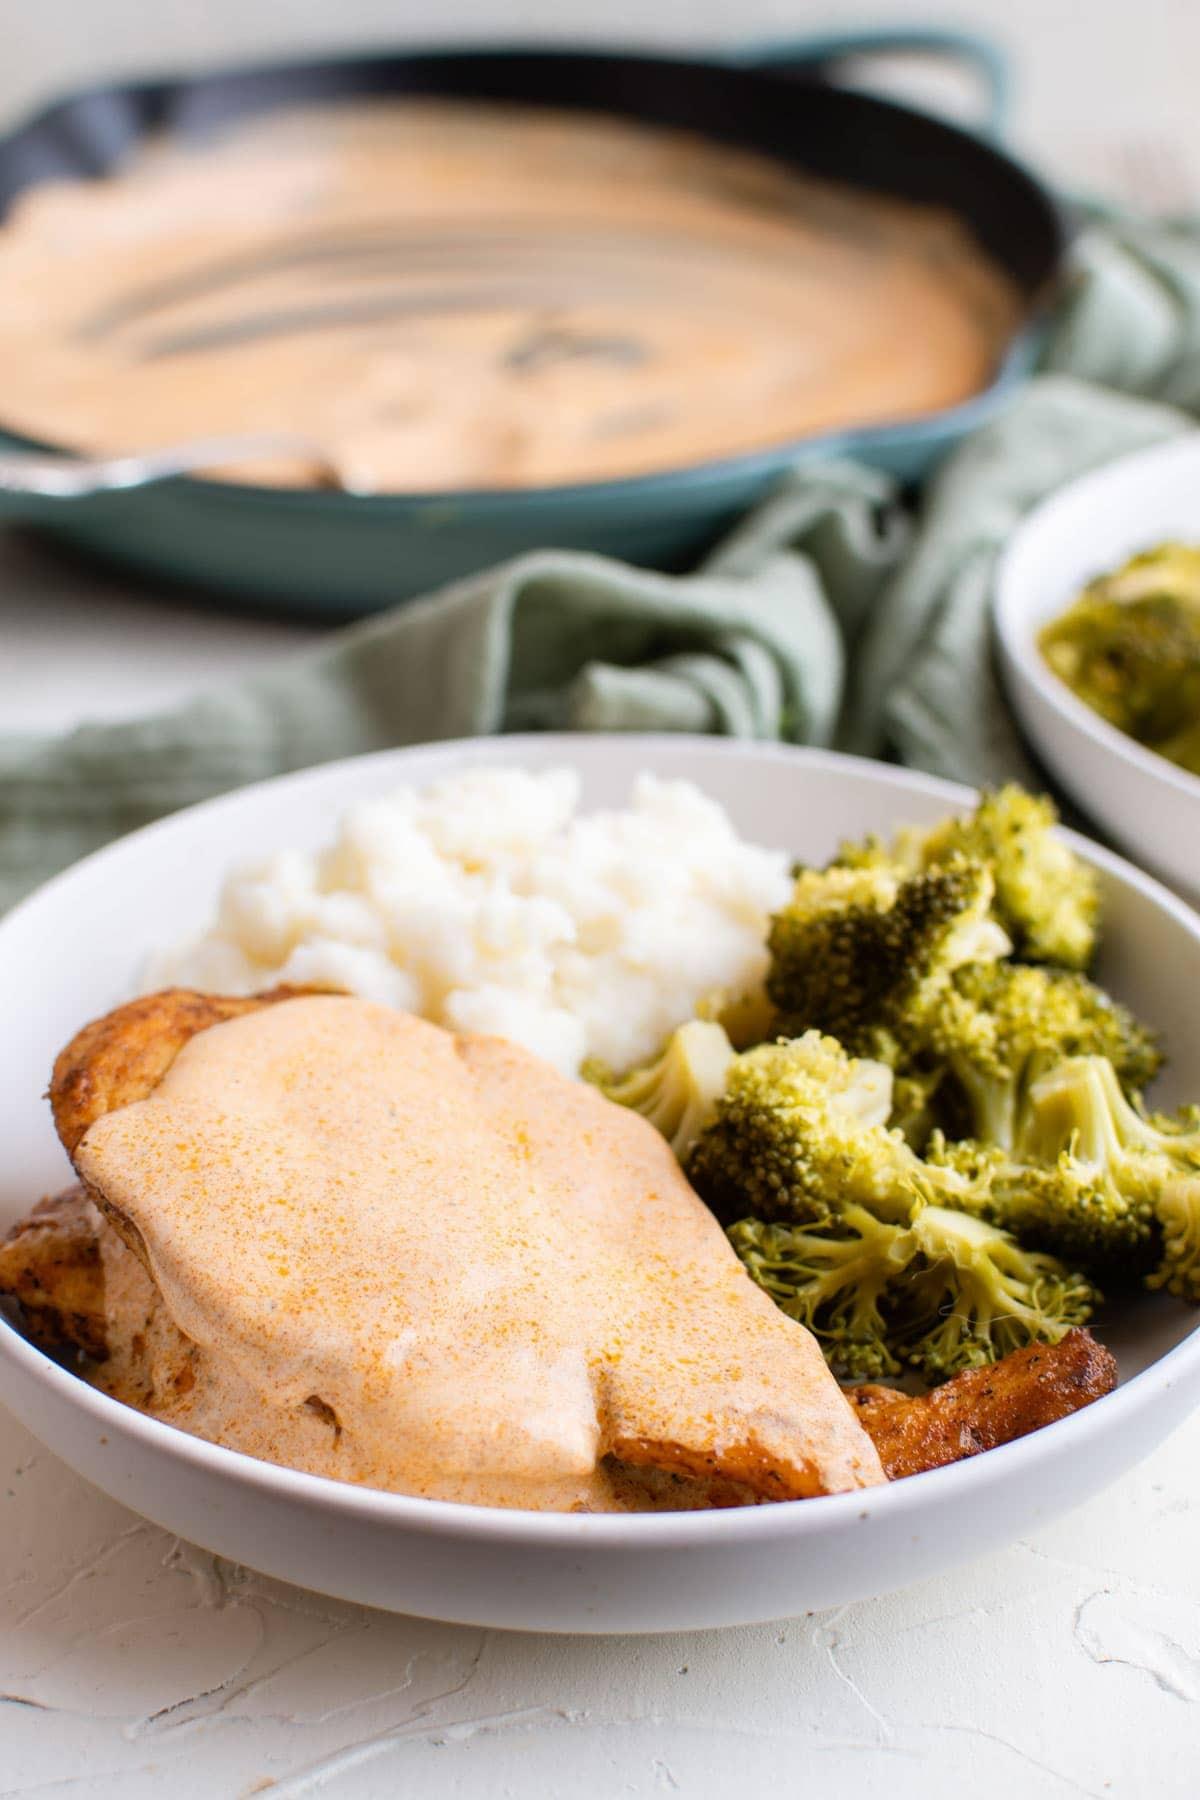 chicken with mustard sauce, broccoli, mashe potatoes